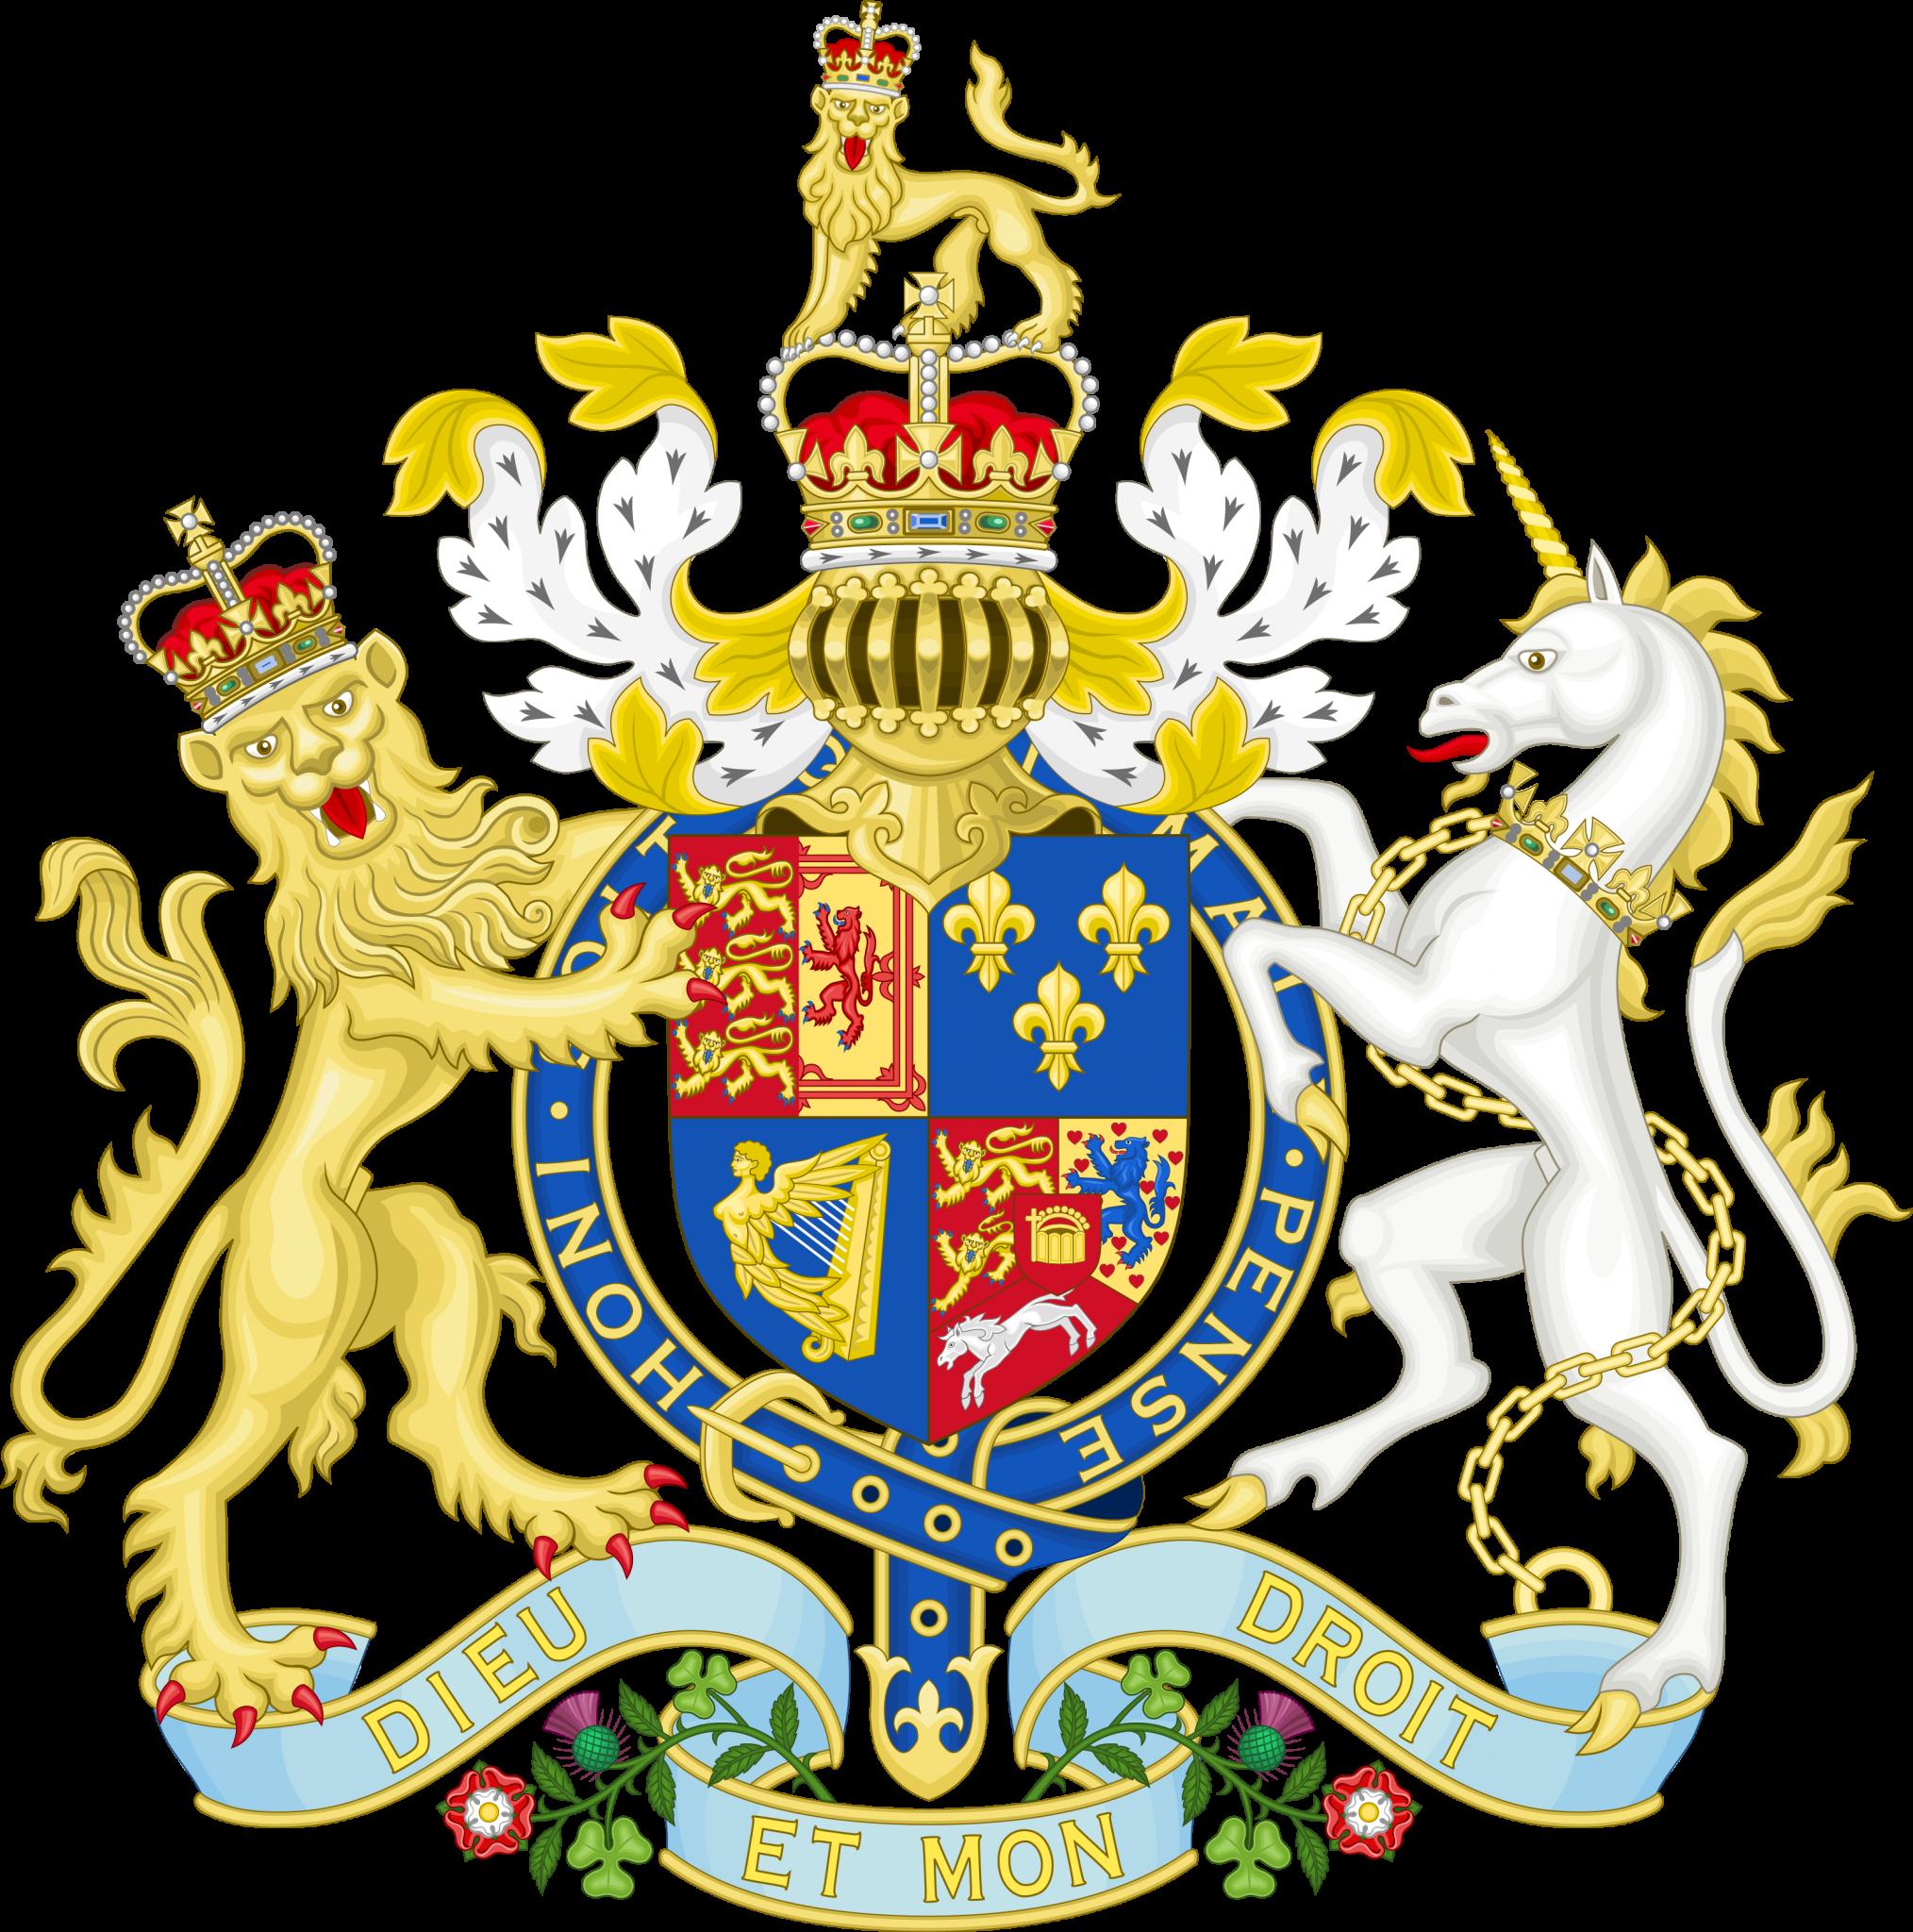 Armoiries de la Grande Bretagne (entre 1714 et 1801)